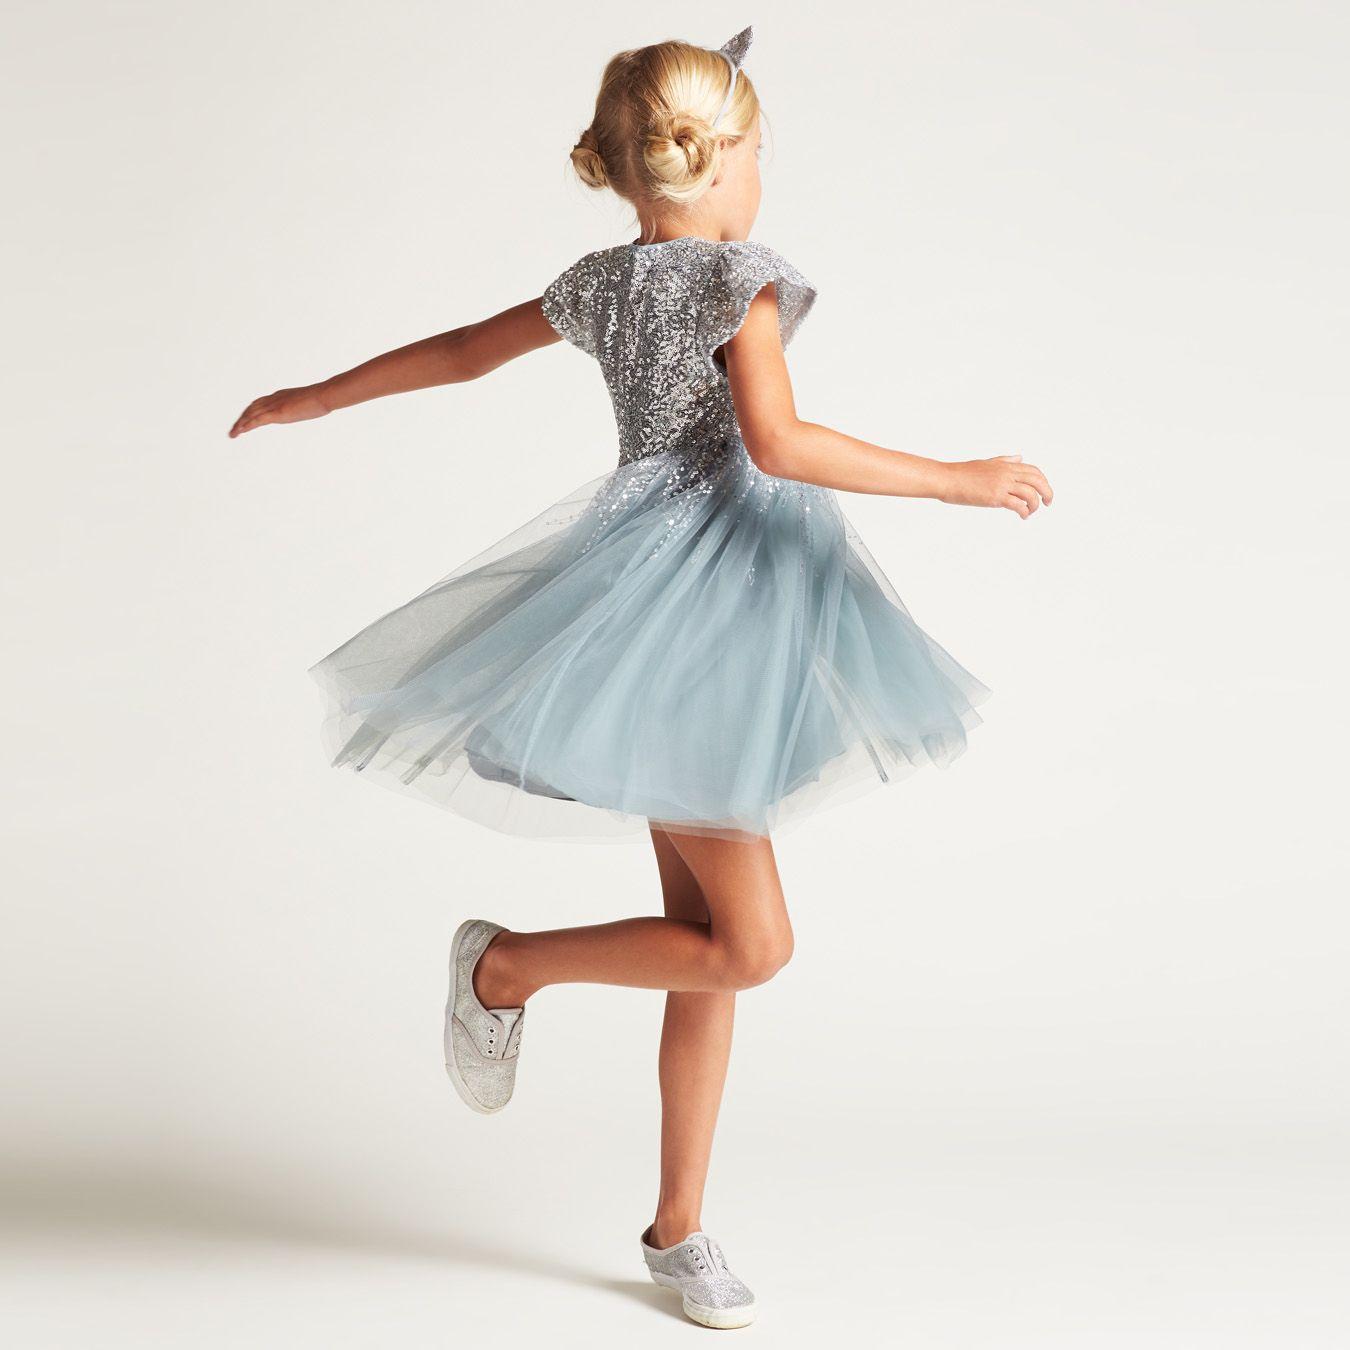 wildandgorgeous Degas Moon Dress - Partywear - Celebrate #celebrate ...